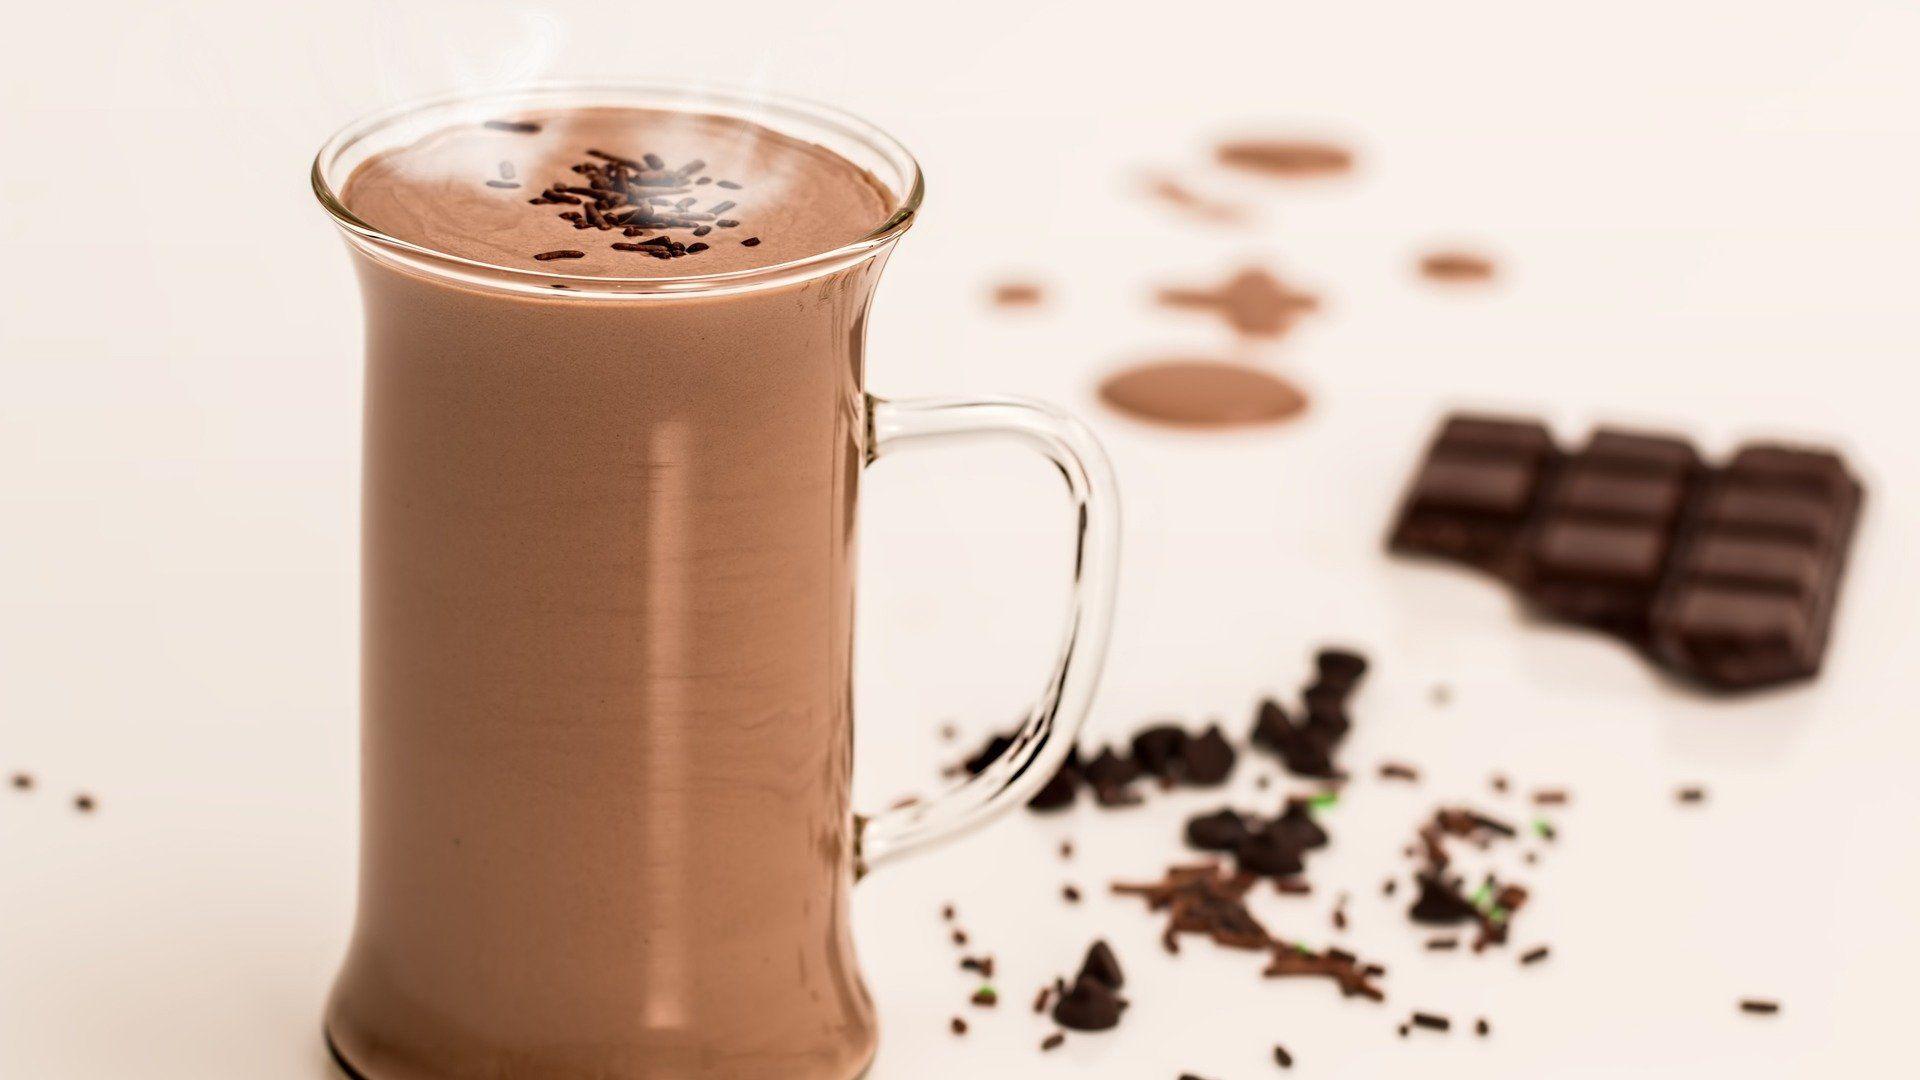 Cacao (bebida) - Sputnik Mundo, 1920, 04.09.2021